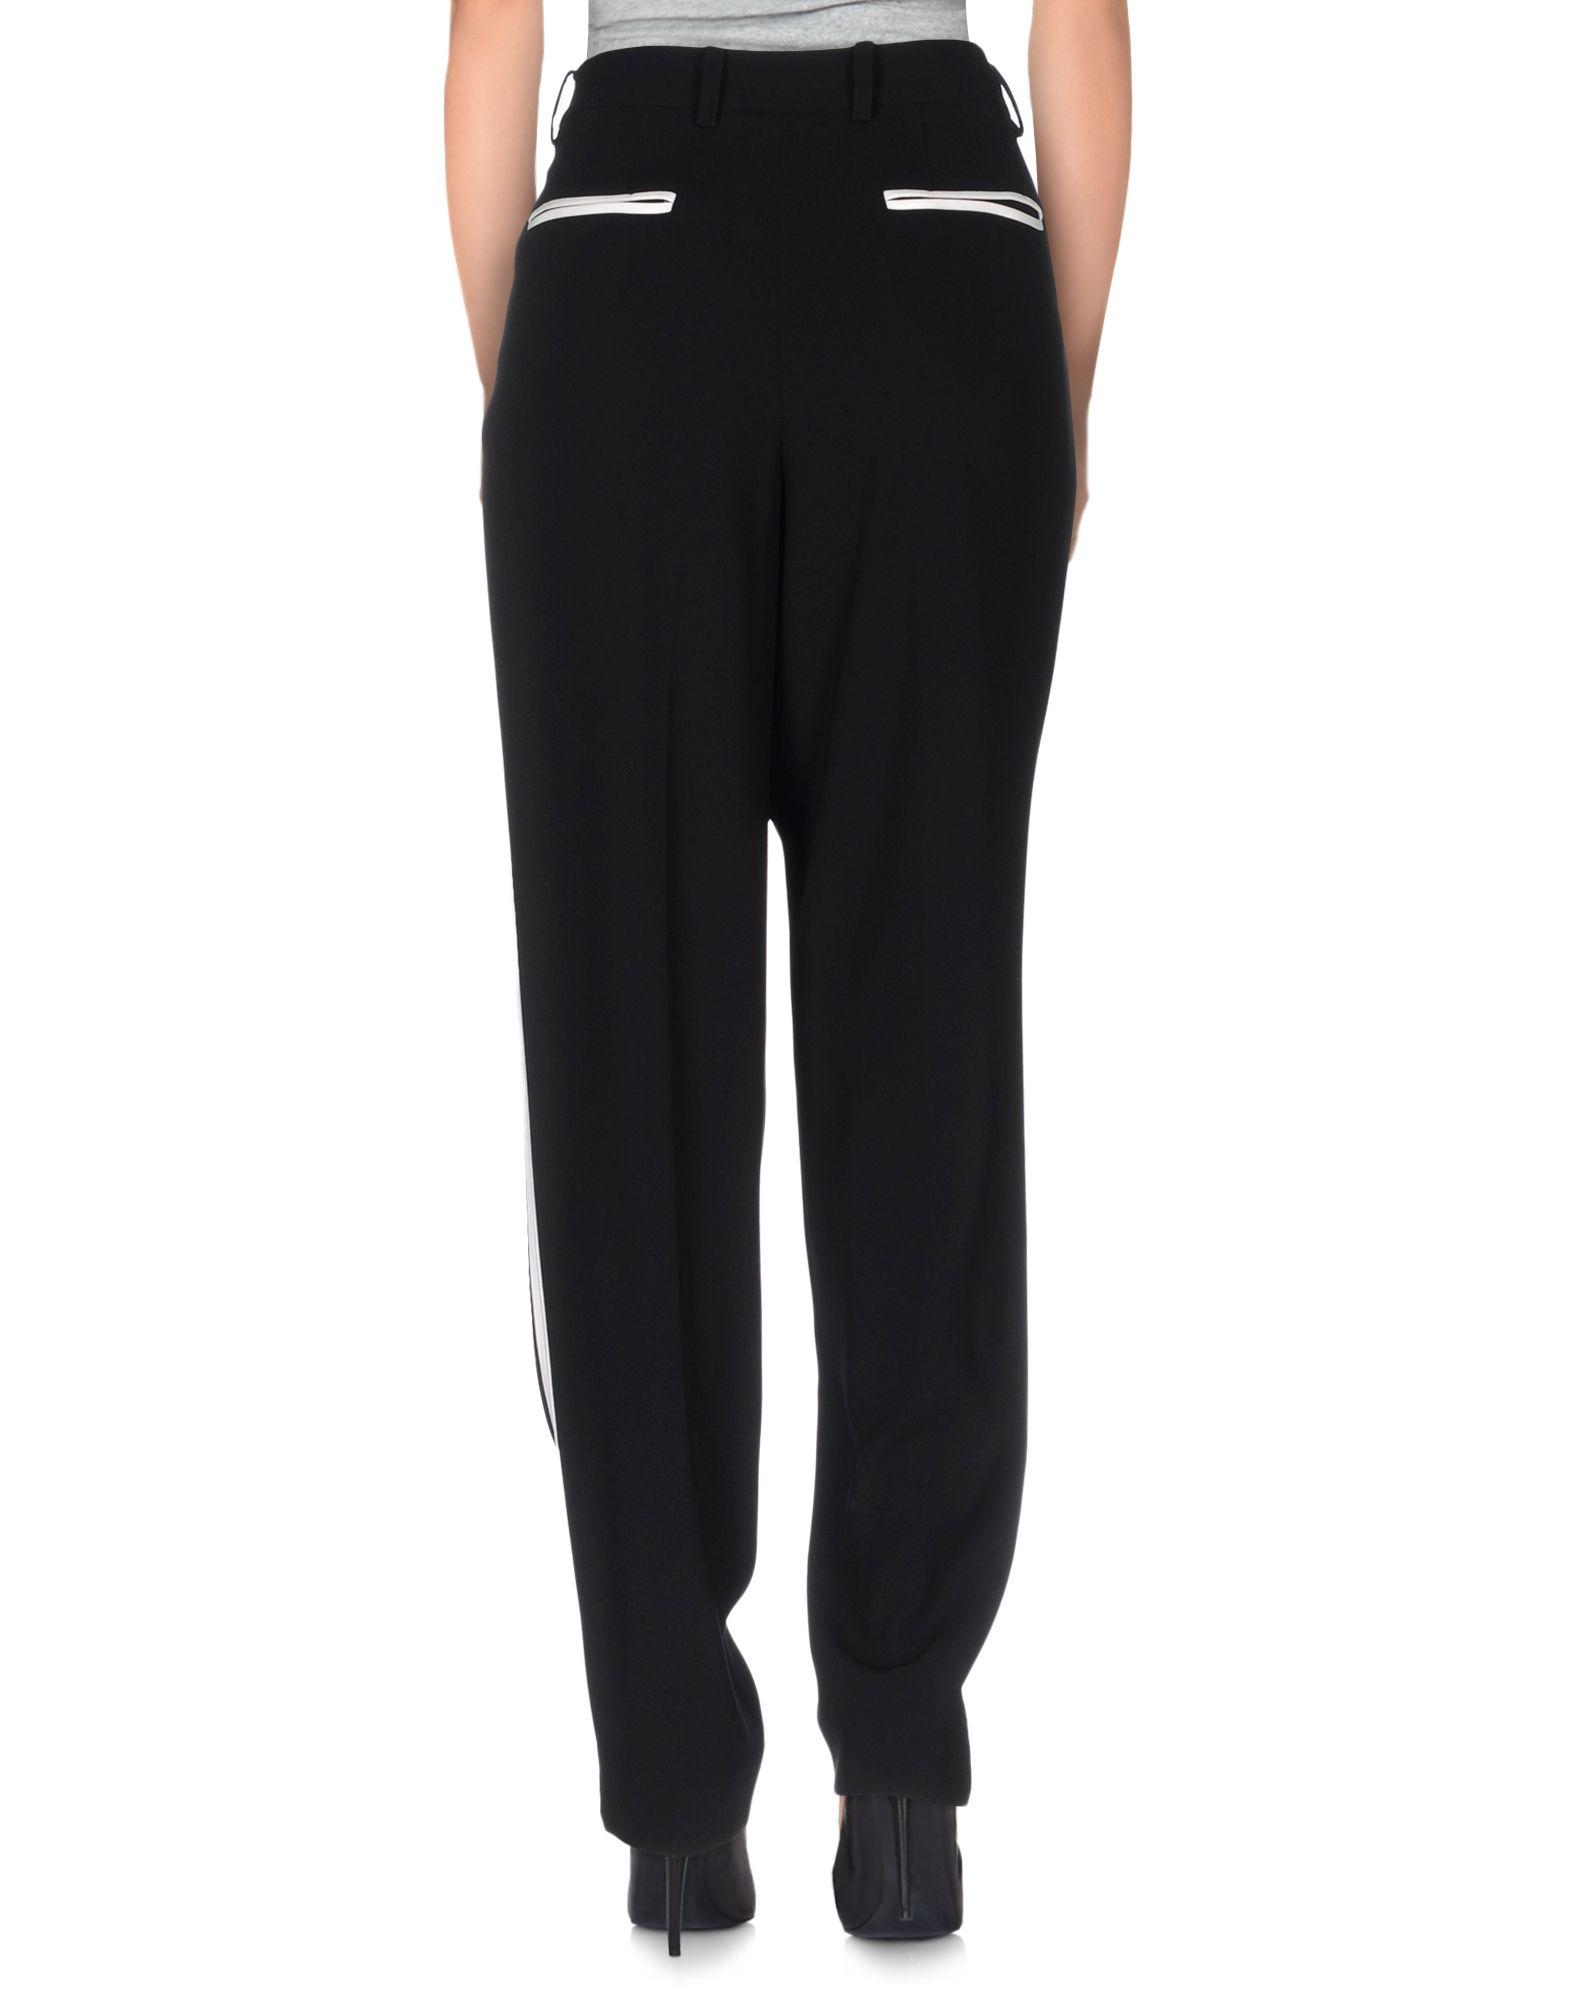 dkny casual trouser in black lyst